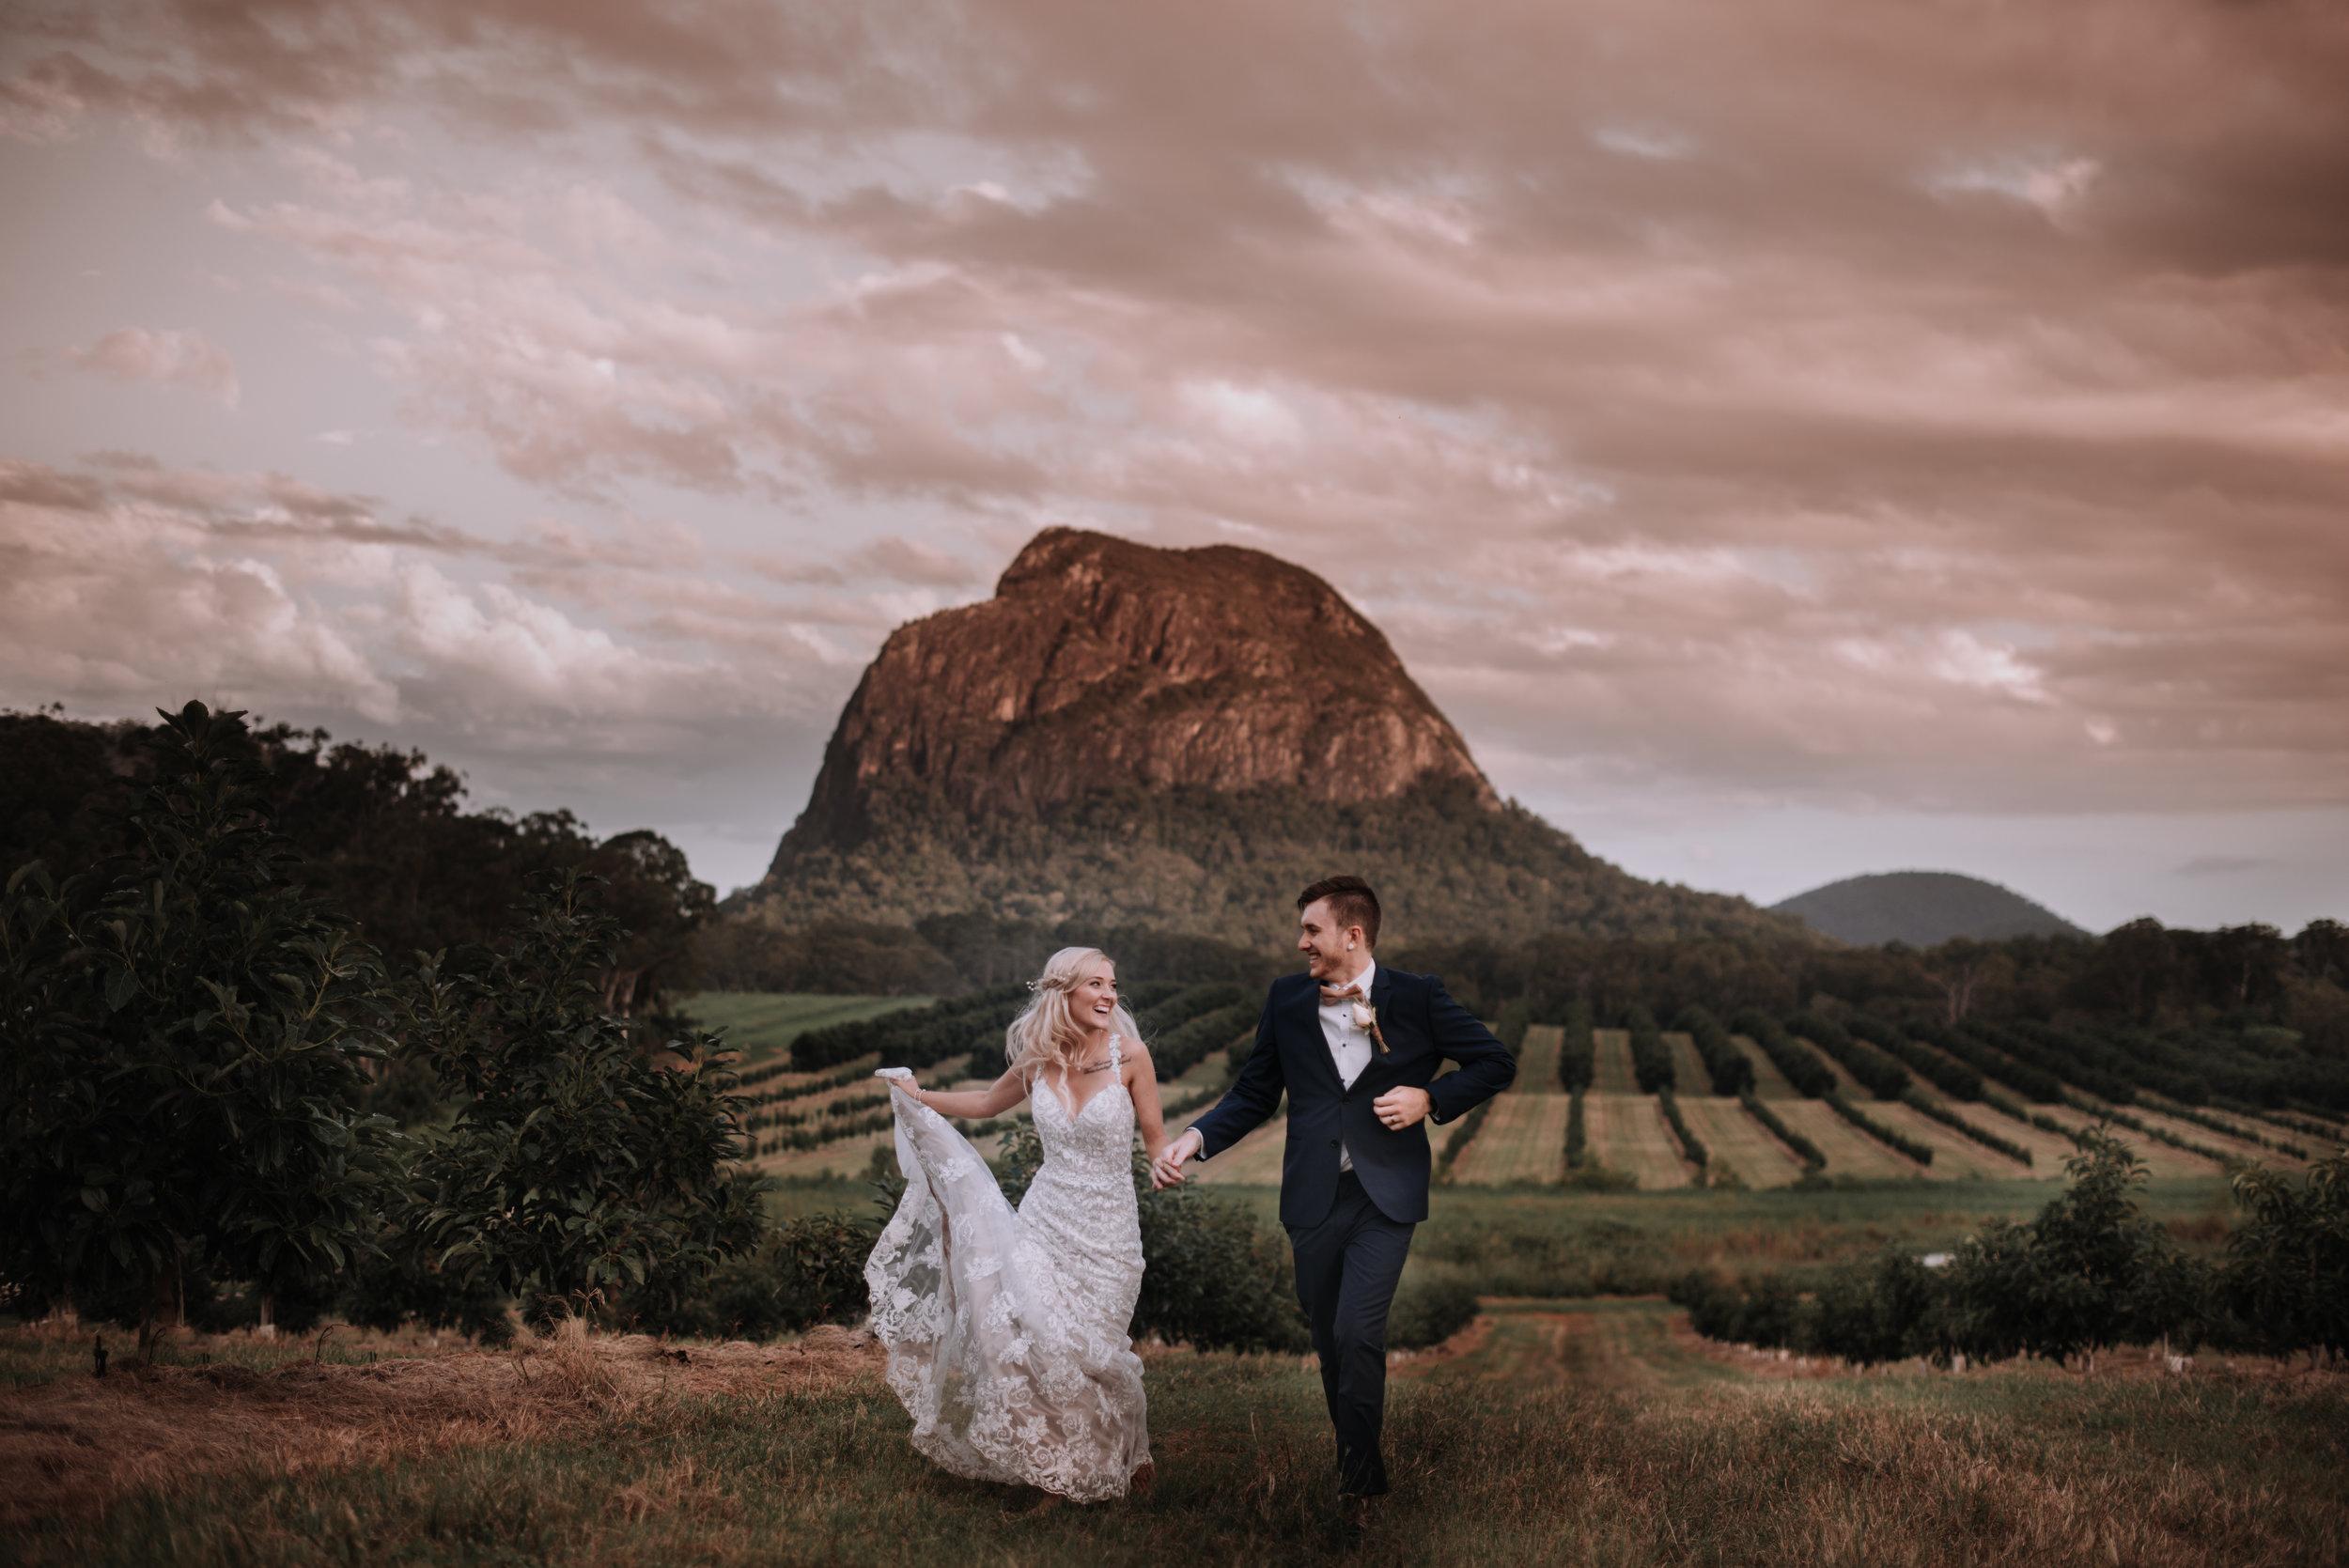 LOVELENSCAPES PHOTOGRAPHY o VISUAL POETRY o BRISBANE WEDDING PHOTOGRAPHER o AMY  TIM o BEERWAH HIDEAWAY o SUNSHINE COAST WEDDING o 3 o 5.jpg